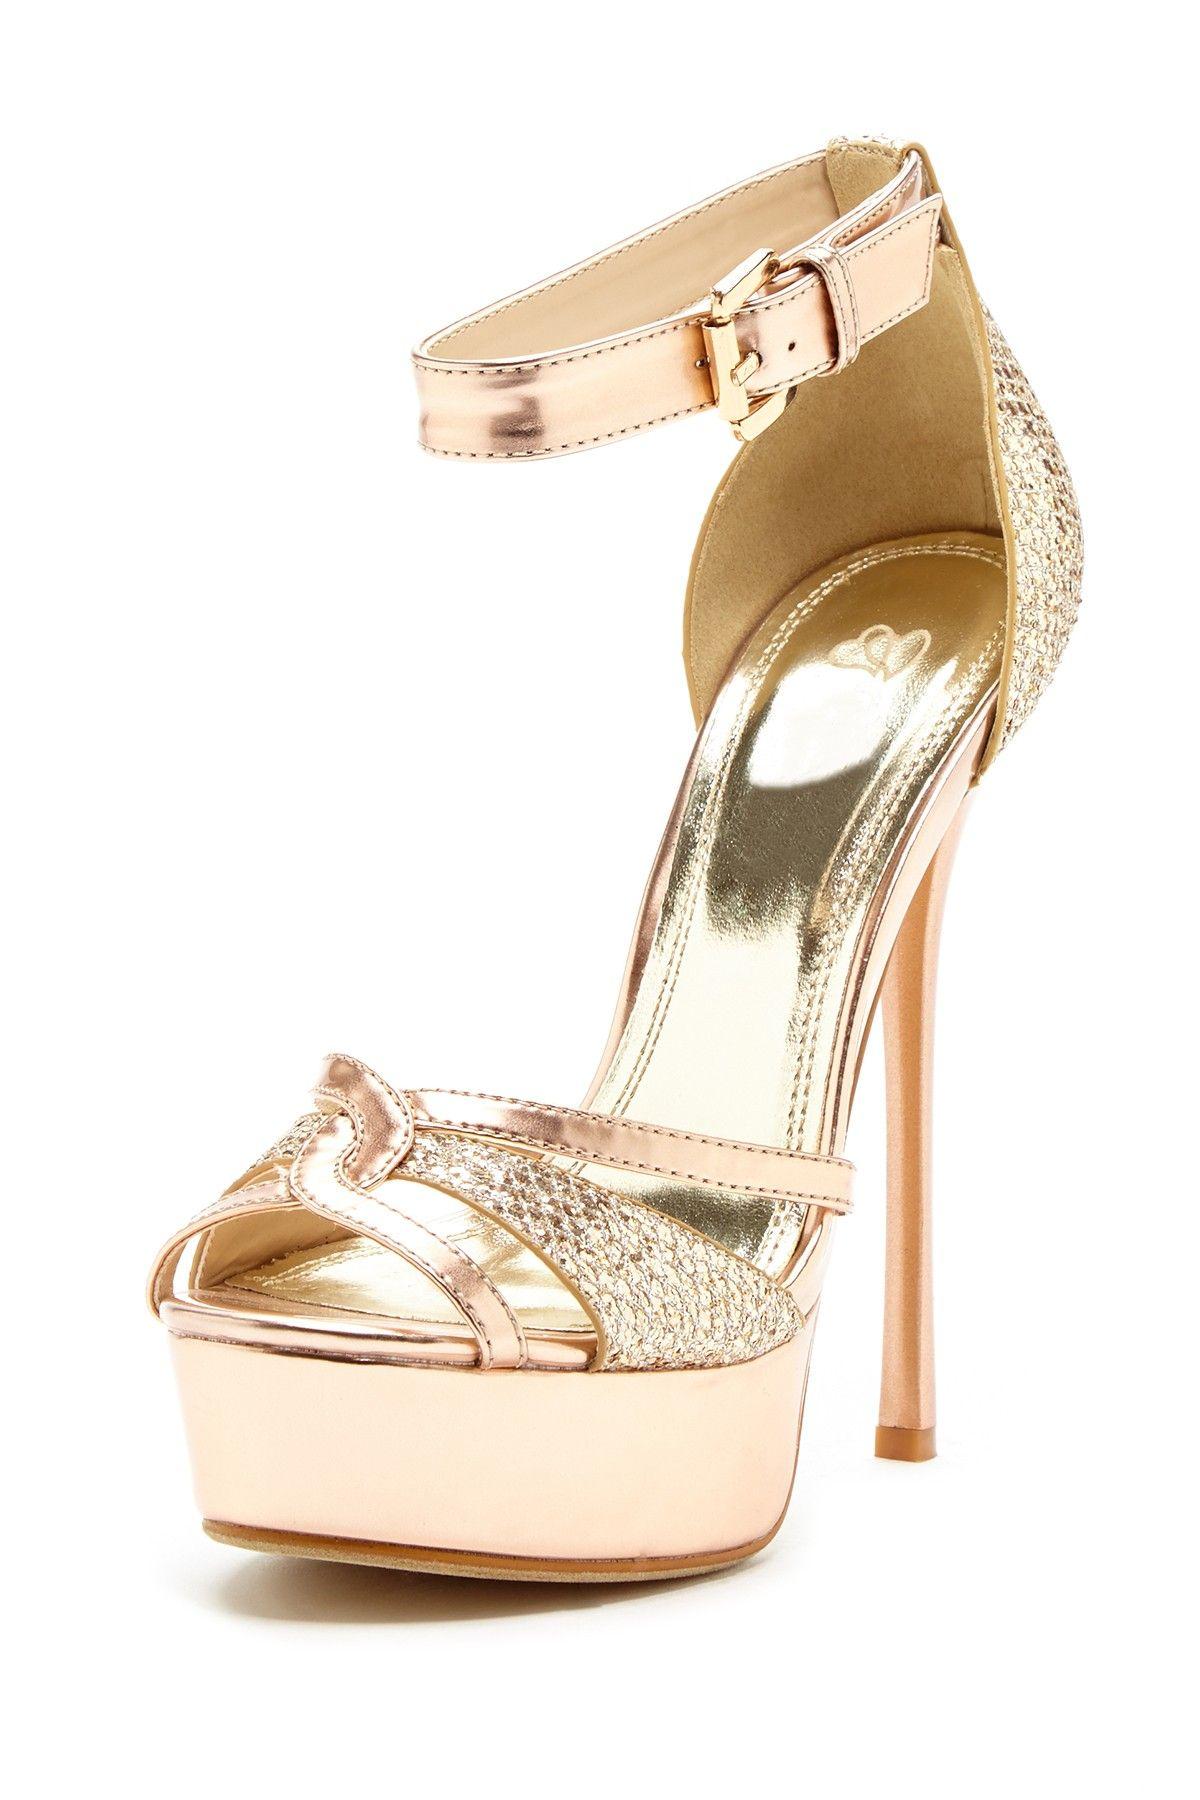 0f268f4c0ee Open Toe High Heel Sandal